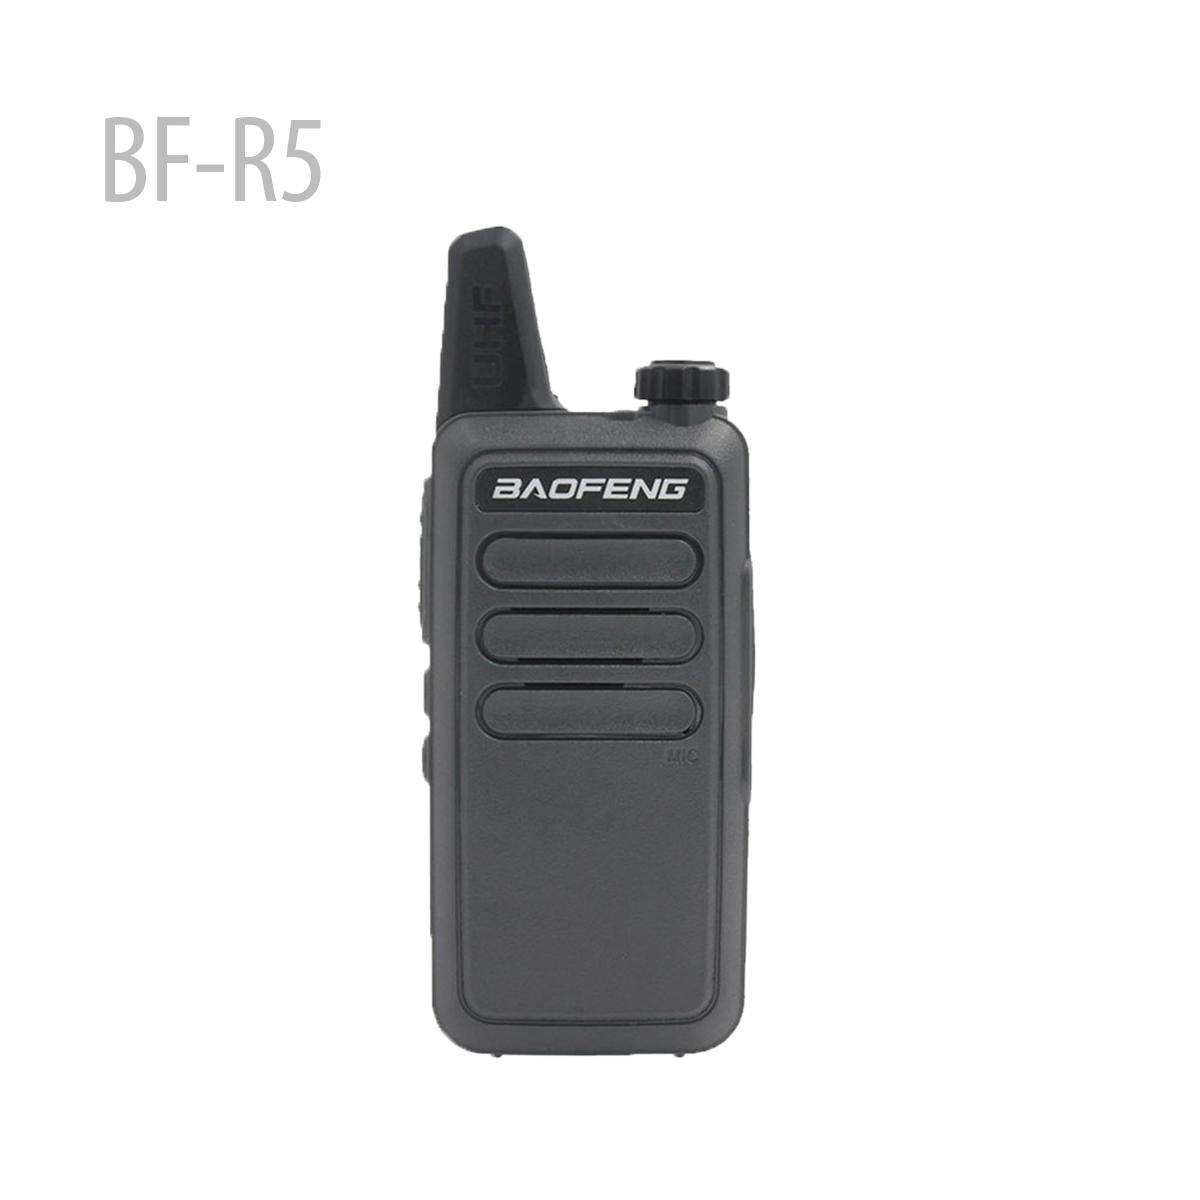 BAOFENG BF-R5 Mini Portable two way radio UHF 400-470MHz